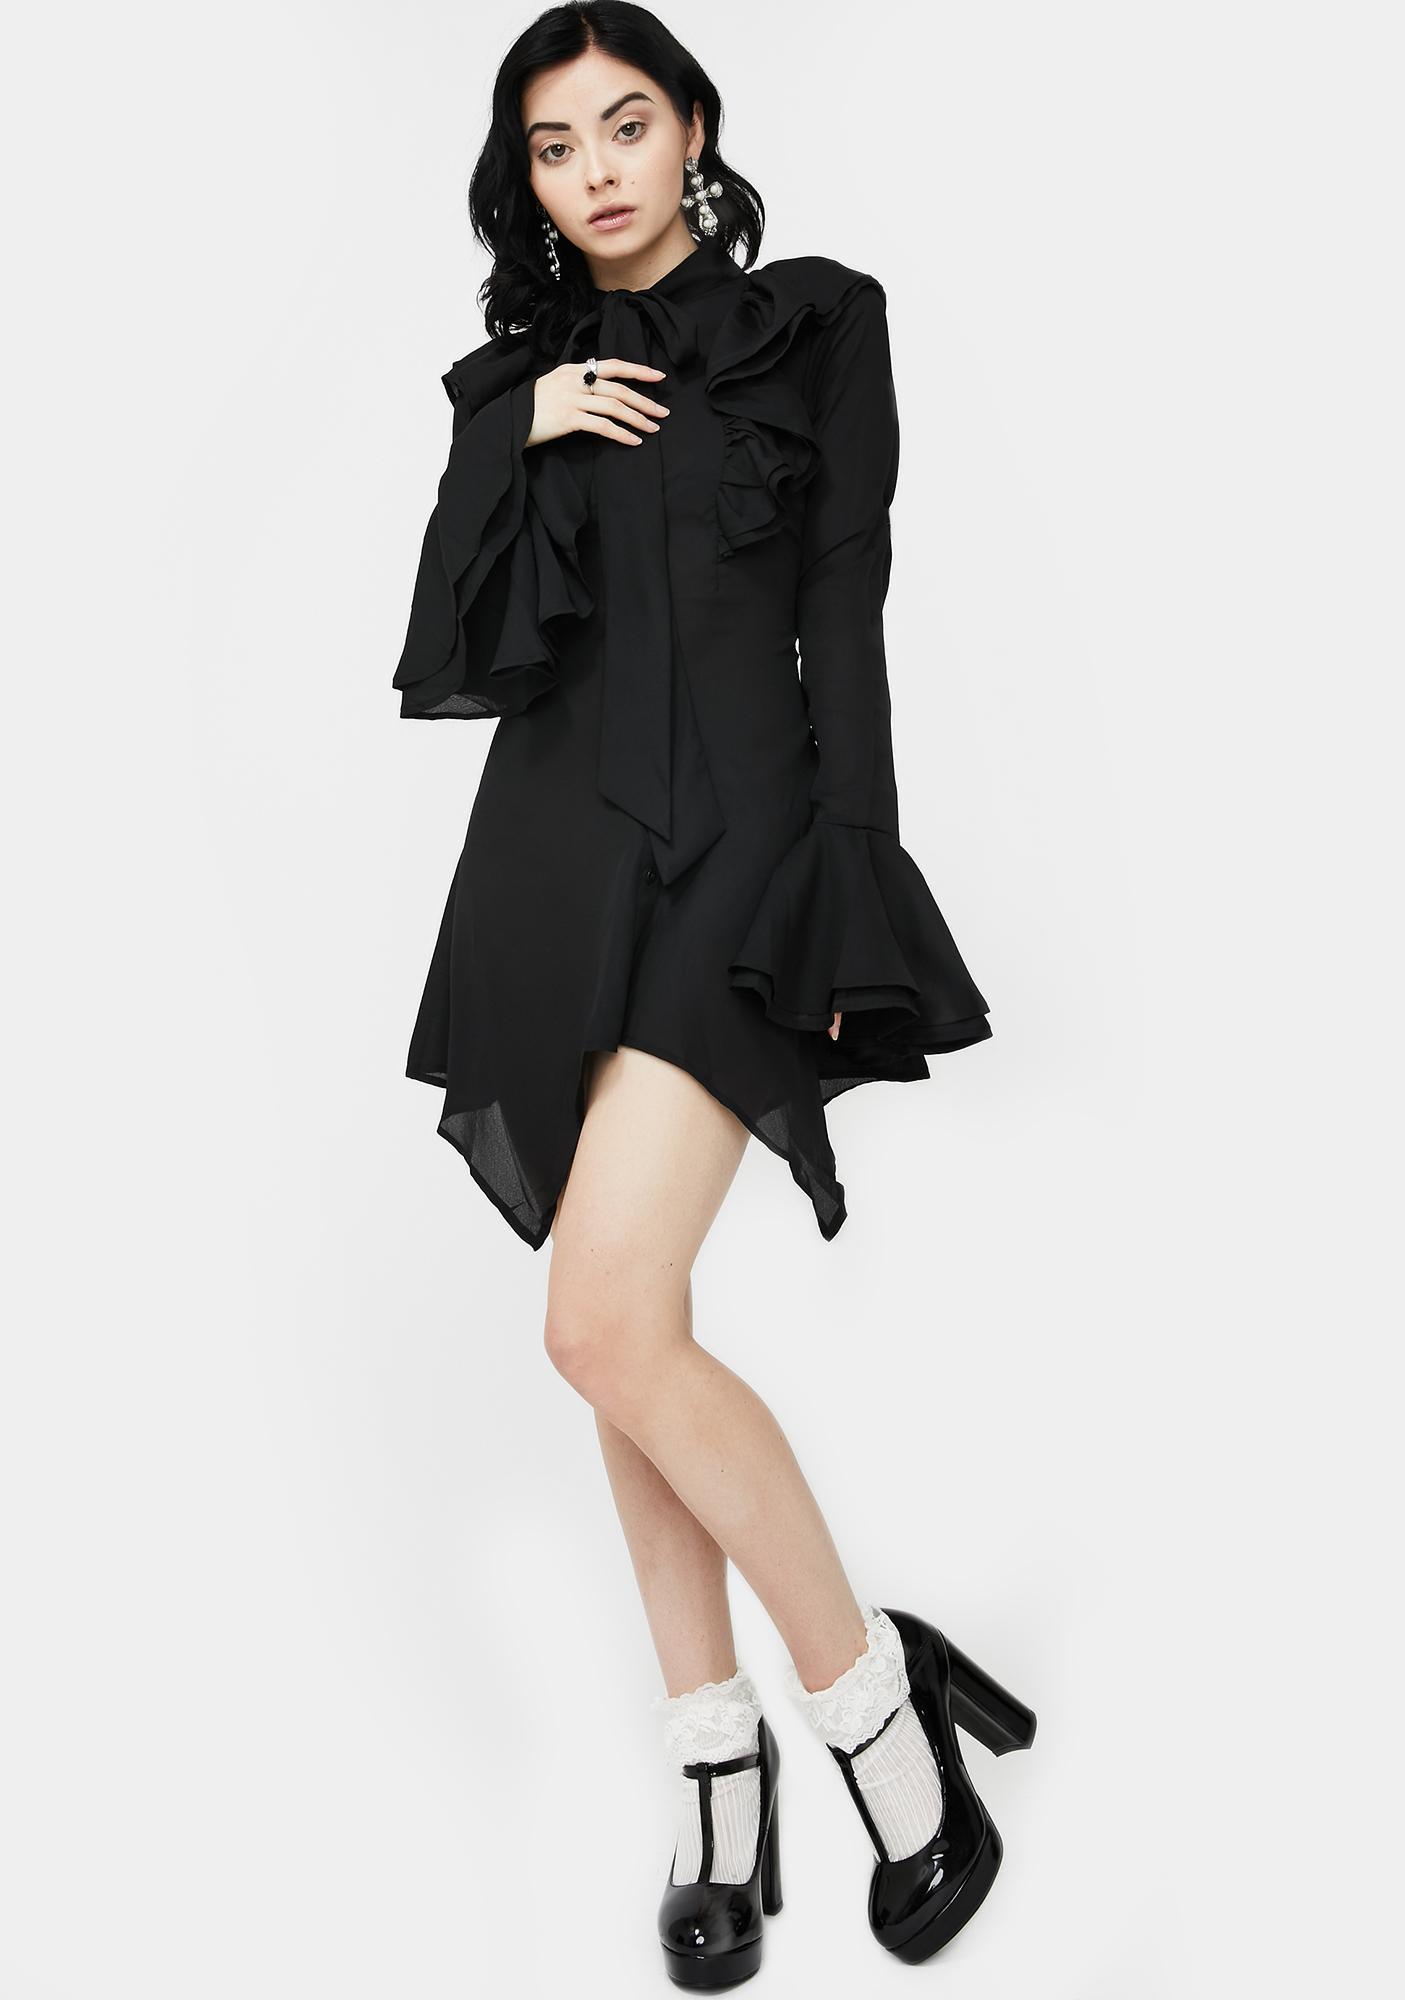 Killstar Runa Chiffon Dress Blouse